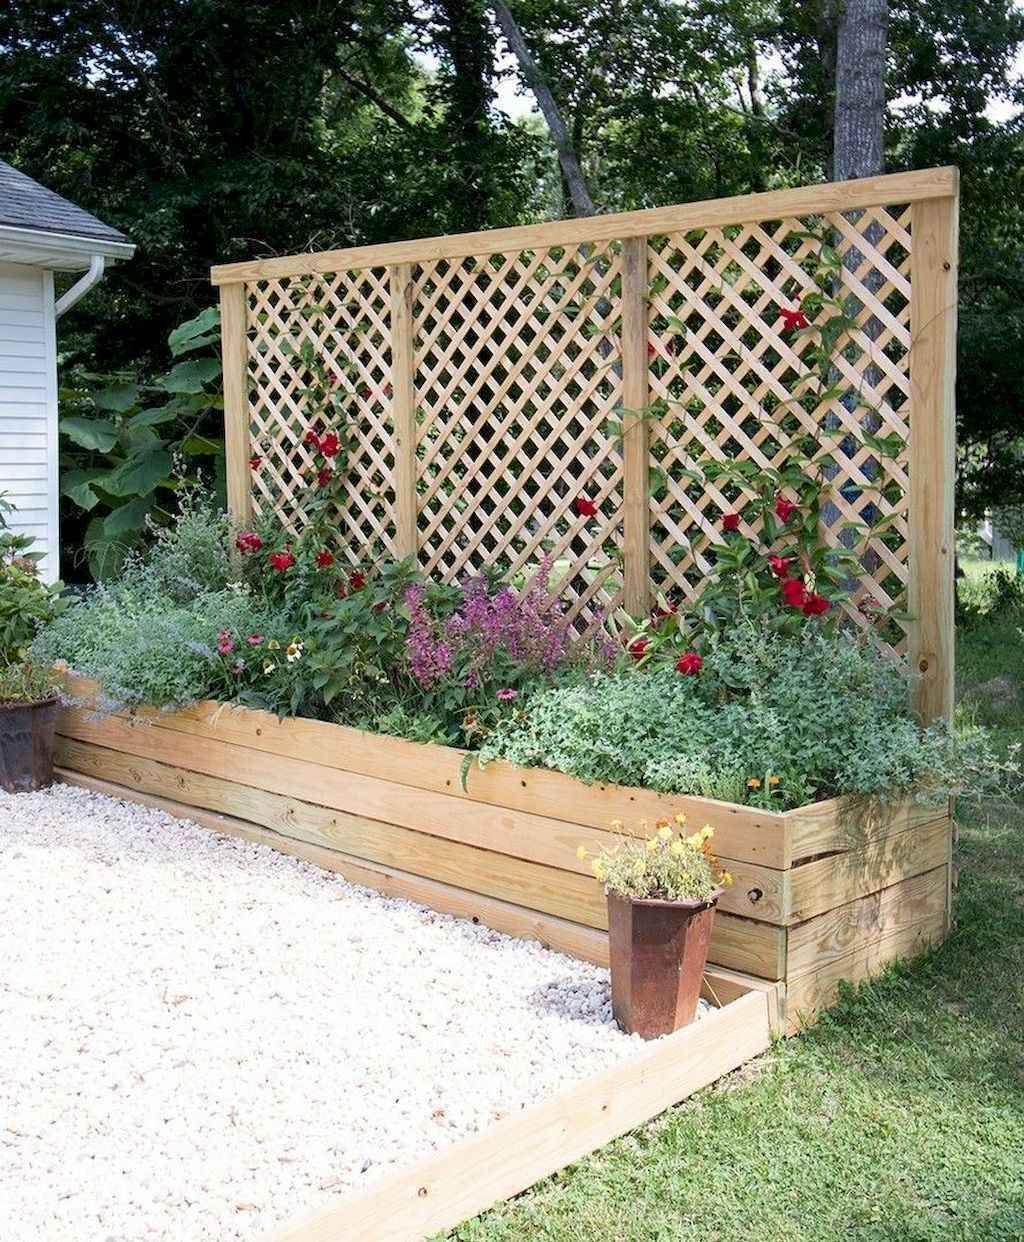 30 Perfect Diy Patio Gardens Design Ideas On A Budget Diy Raised